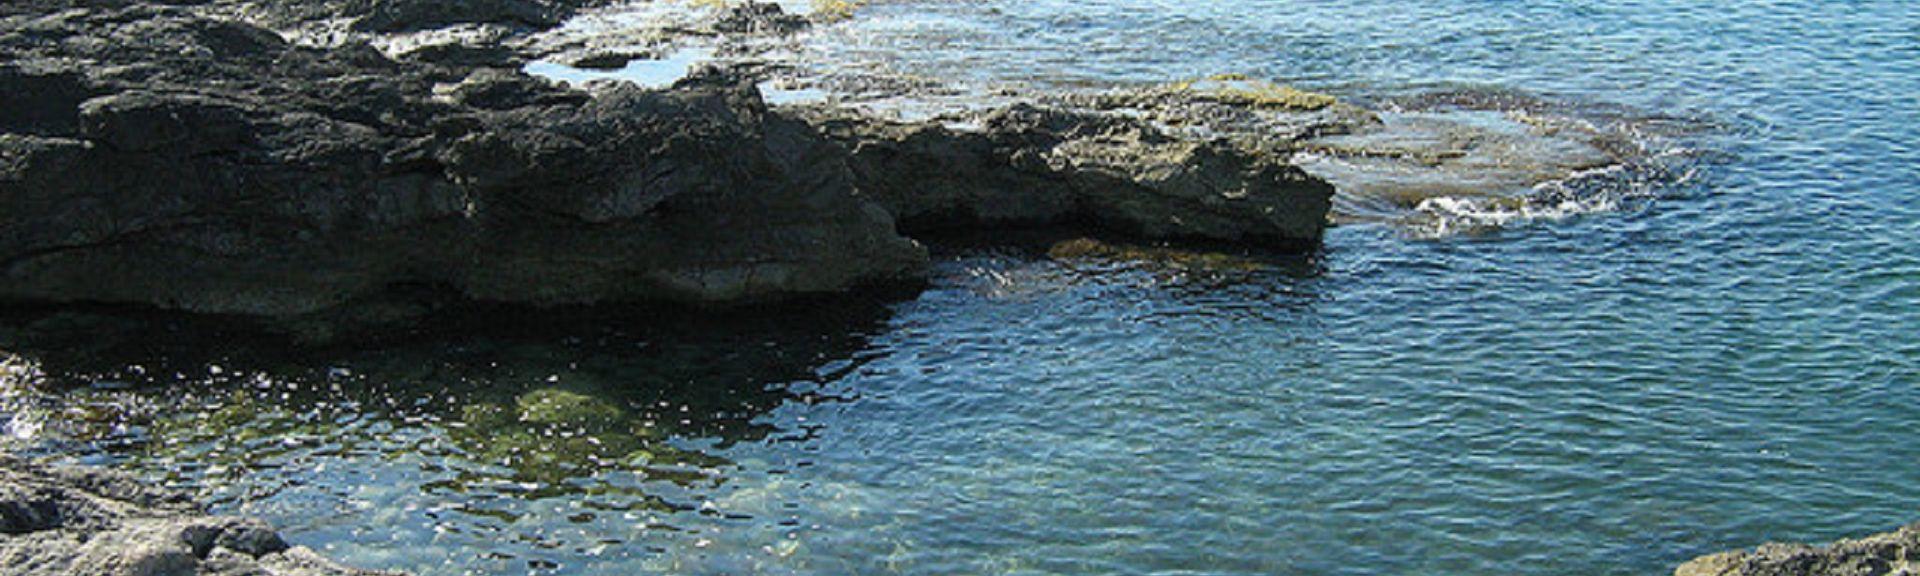 Donnalucata, Sicilia, Italia